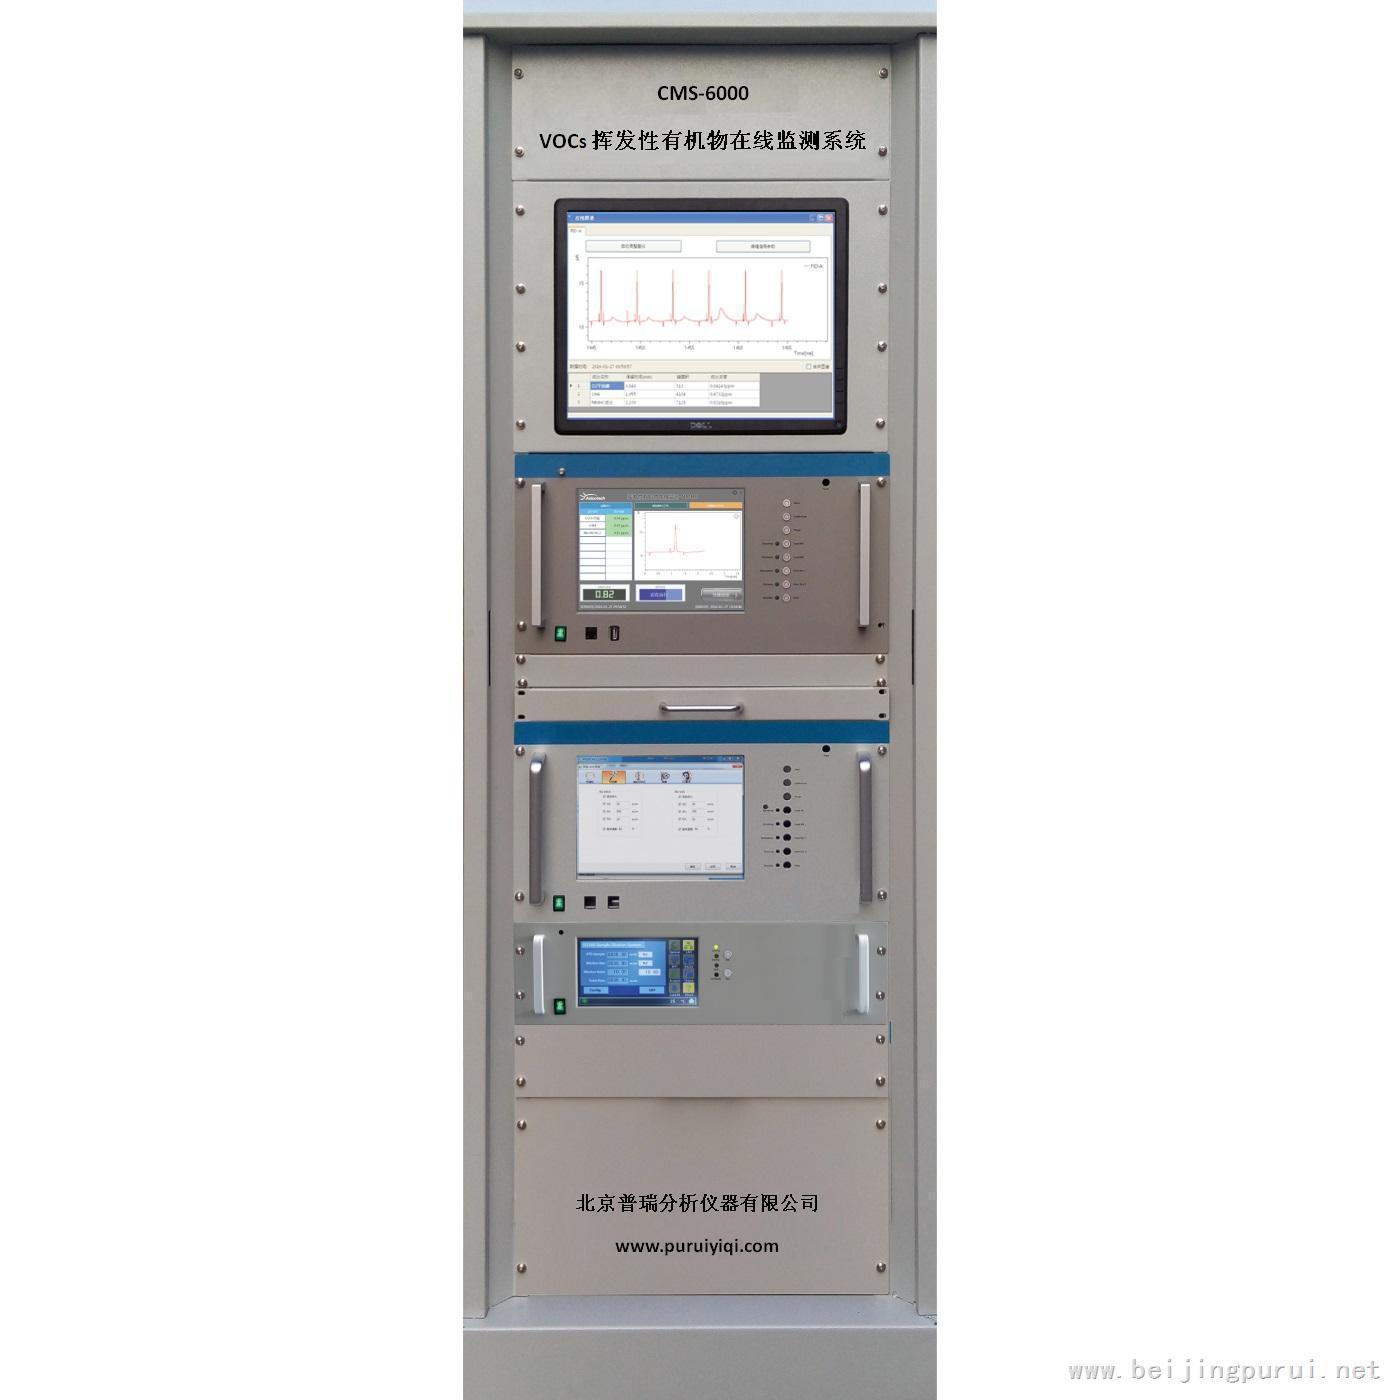 VOCs挥发性有机物在线监测系统 非甲烷总烃在线监测 苯系物在线监测